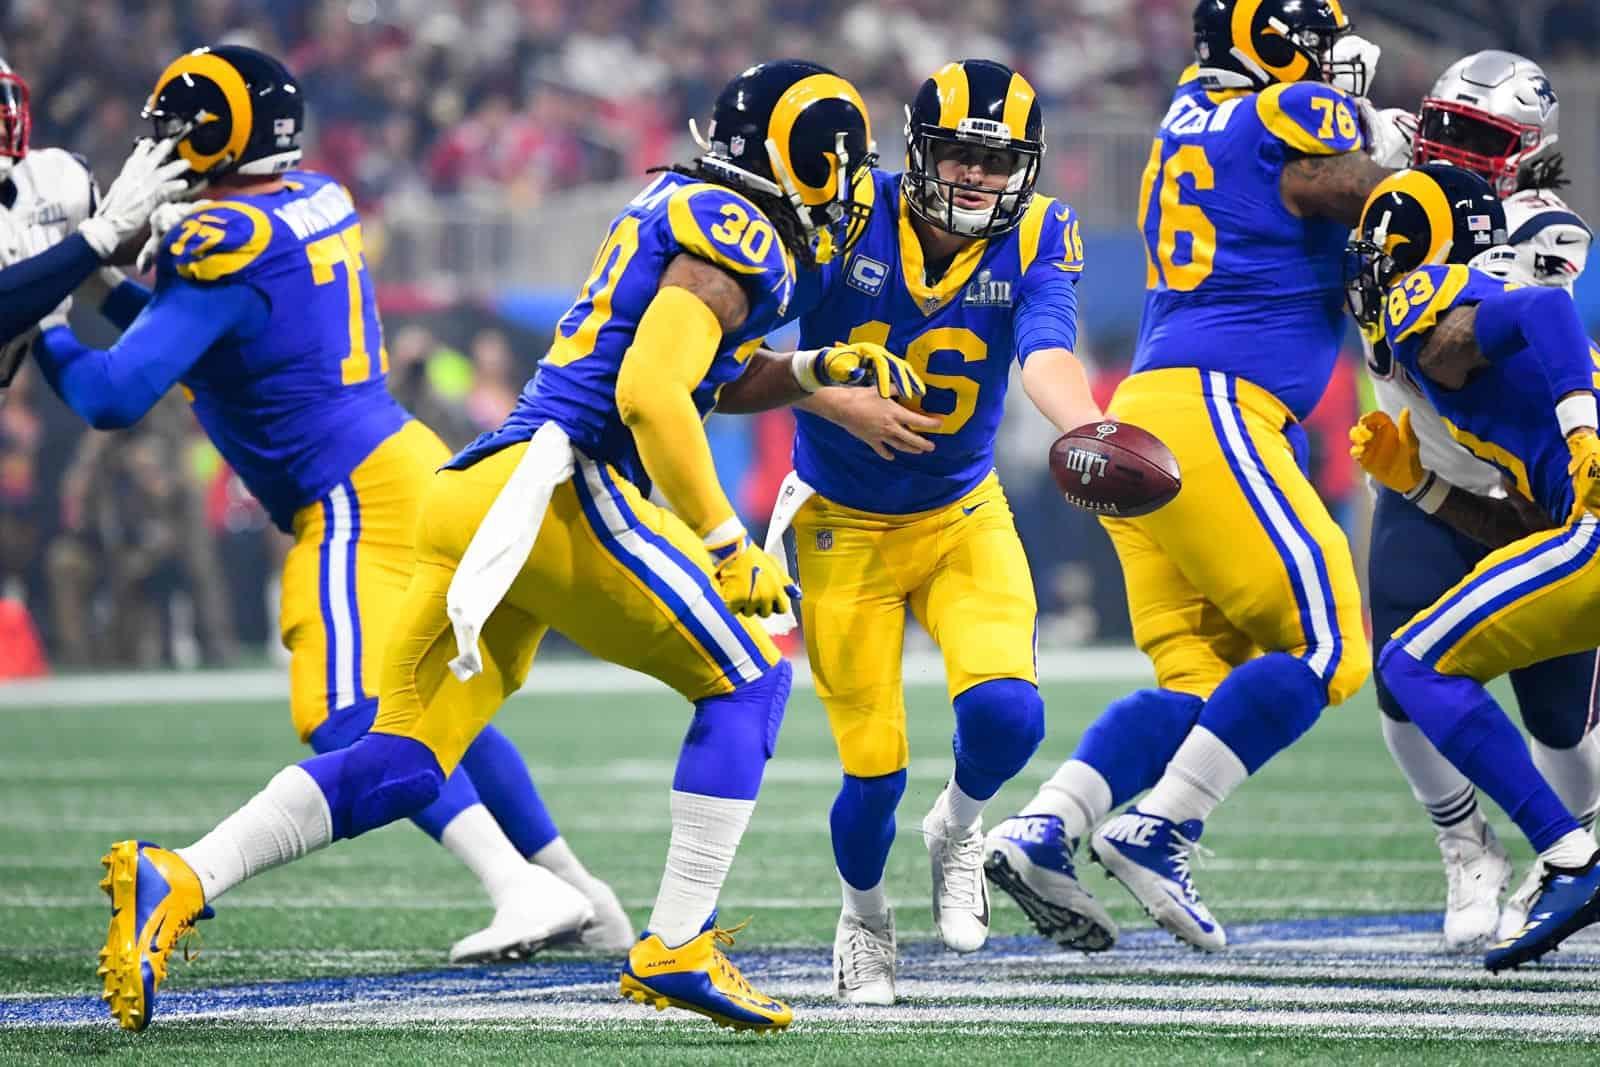 2019 NFL Sunday Night Football Schedule